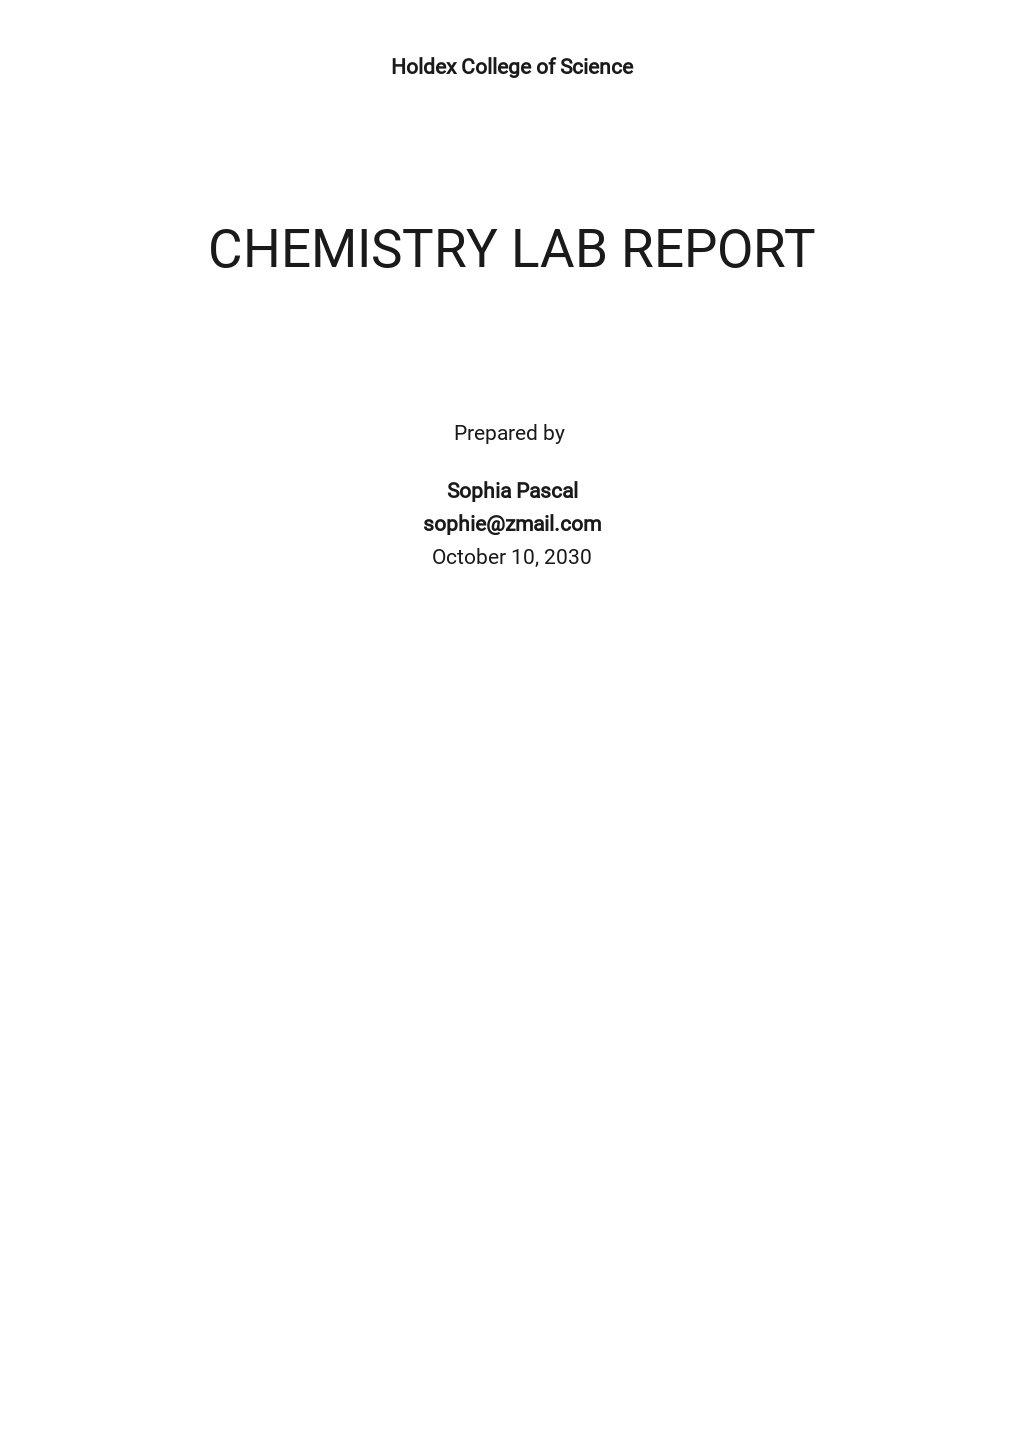 Chemistry Lab Report Template .jpe